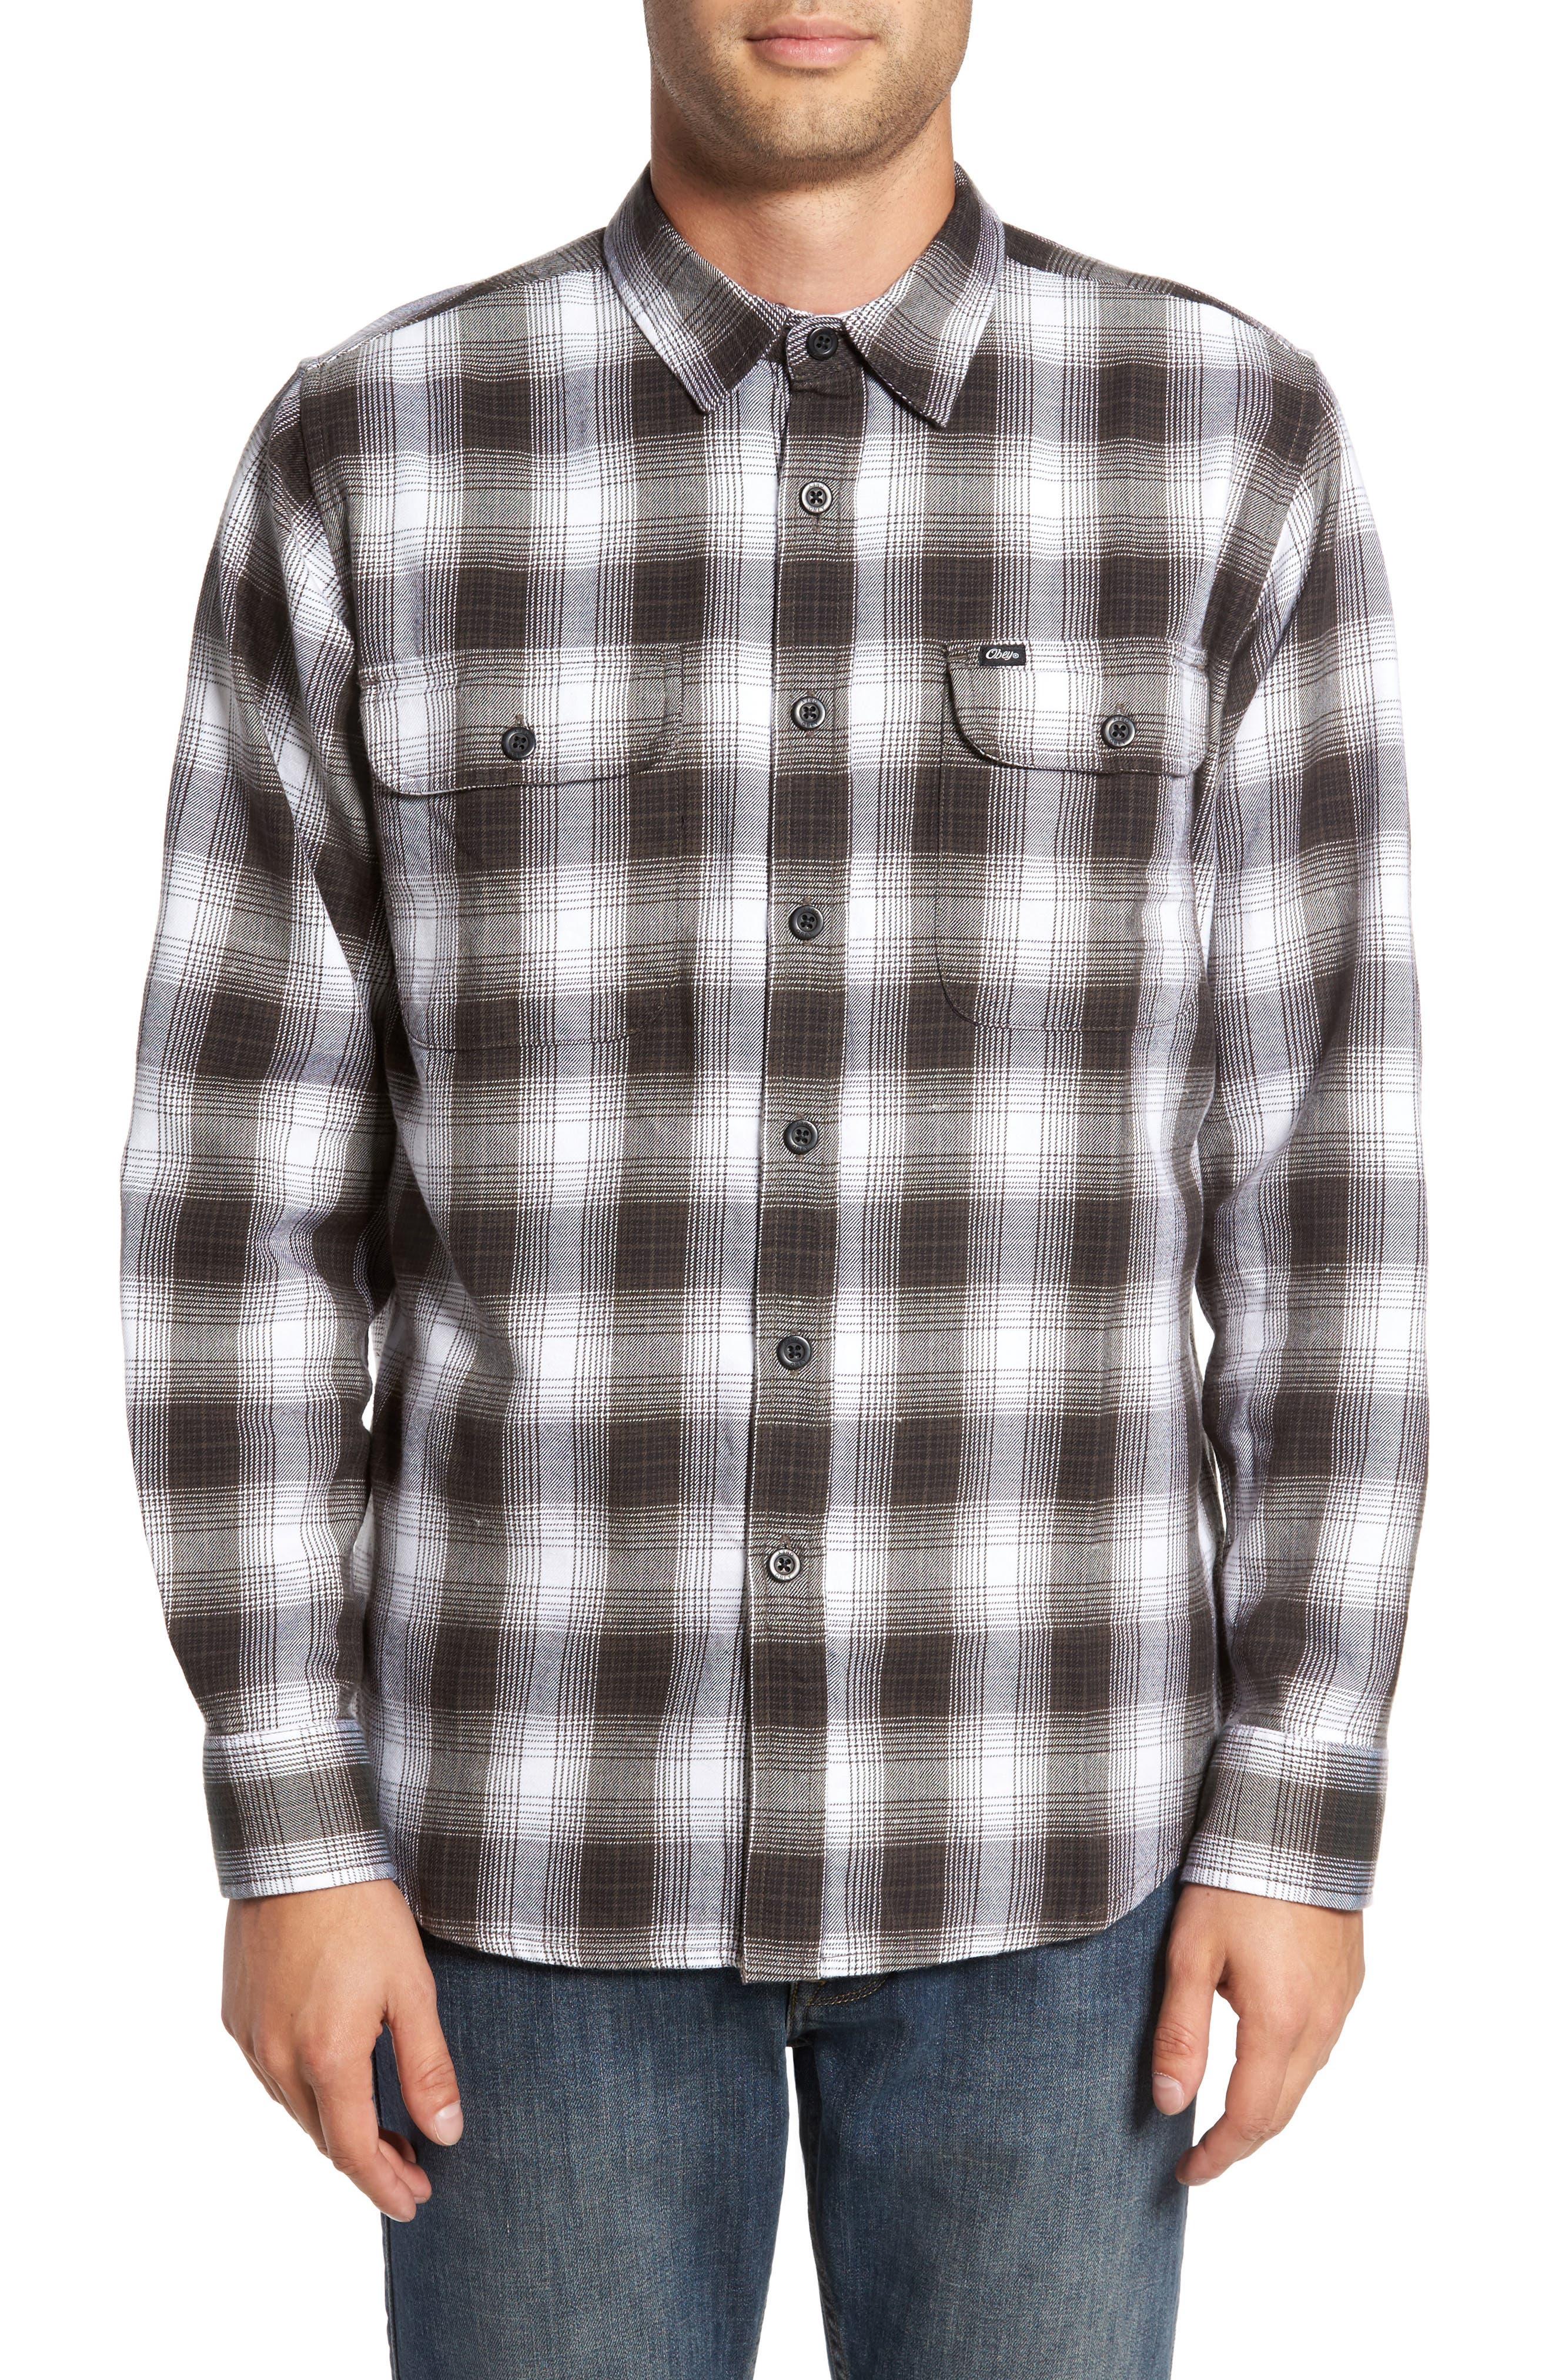 Kemper Plaid Woven Shirt,                         Main,                         color, 002